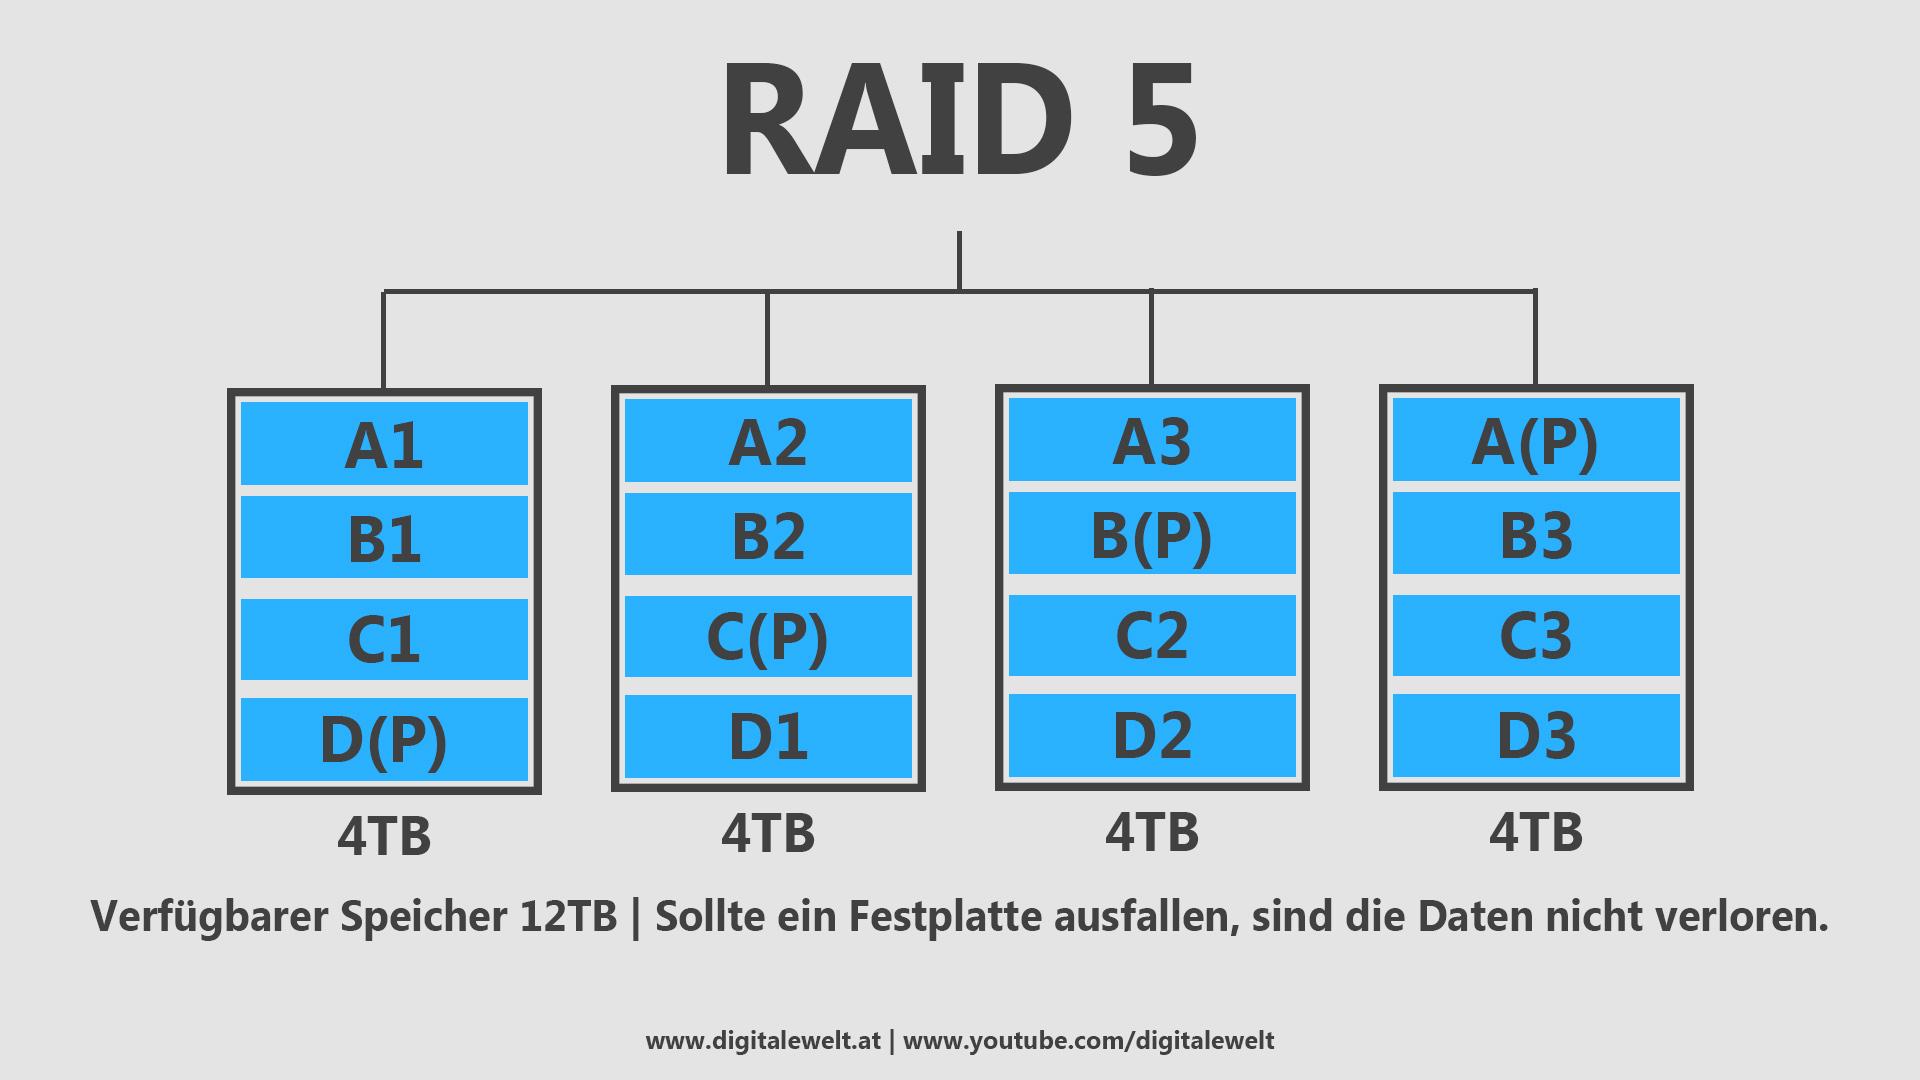 RAID-Systeme - RAID 5